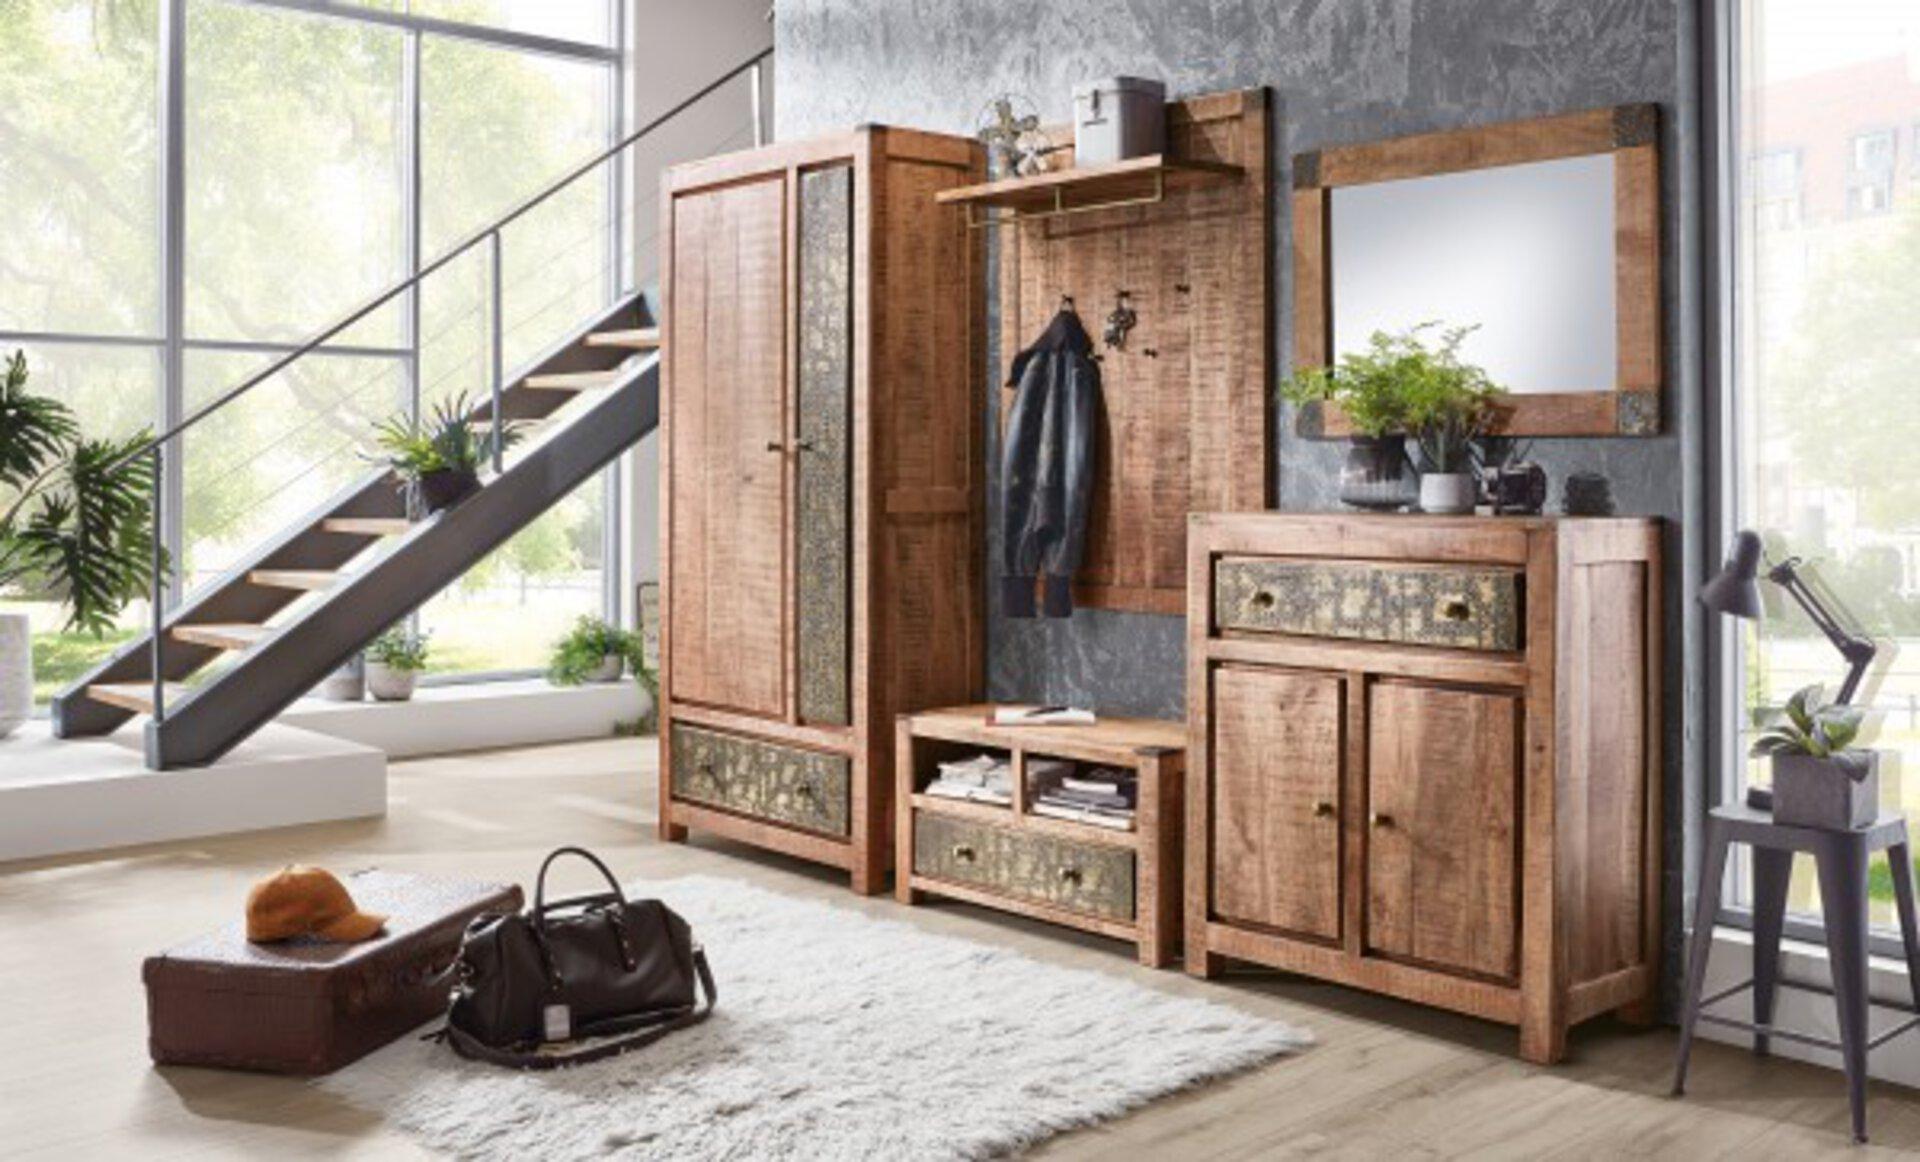 Garderobenpaneel CURL Vito Holz 30 x 125 x 90 cm